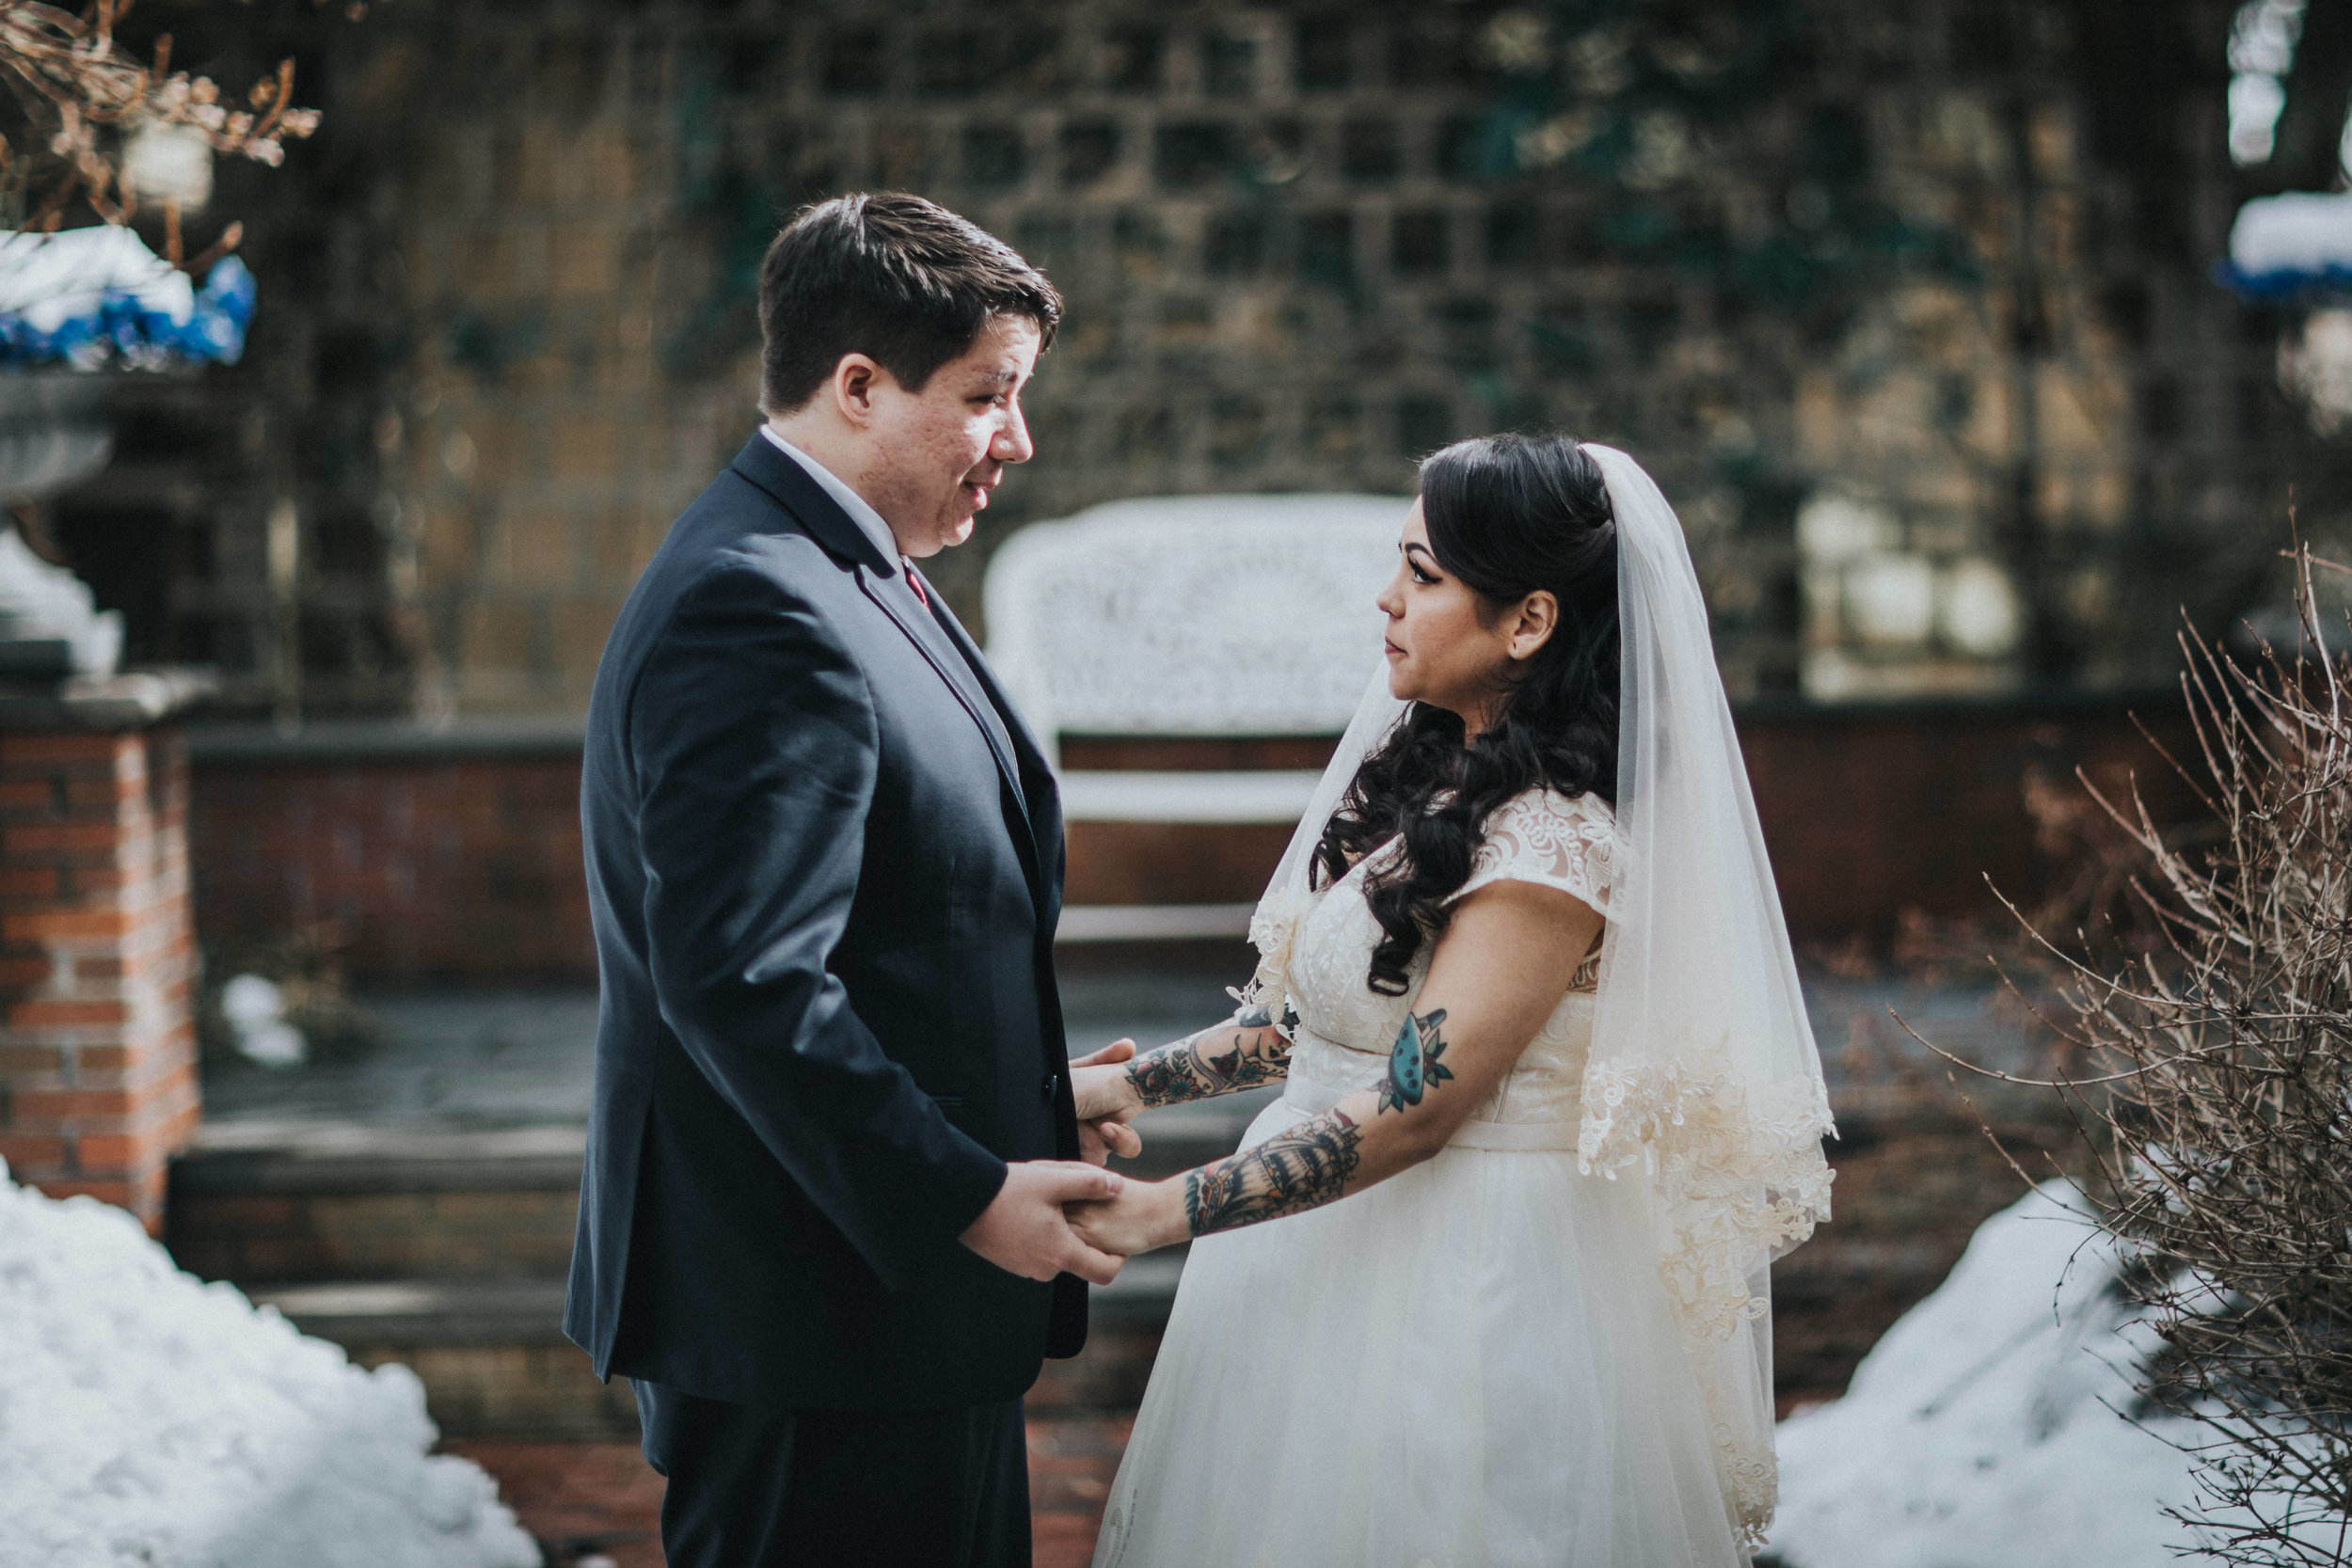 New-Jersey-Wedding-Photographer-ReceptionCenter-Valeria&Mike-First-Look-Bride&Groom (20 of 69).jpg